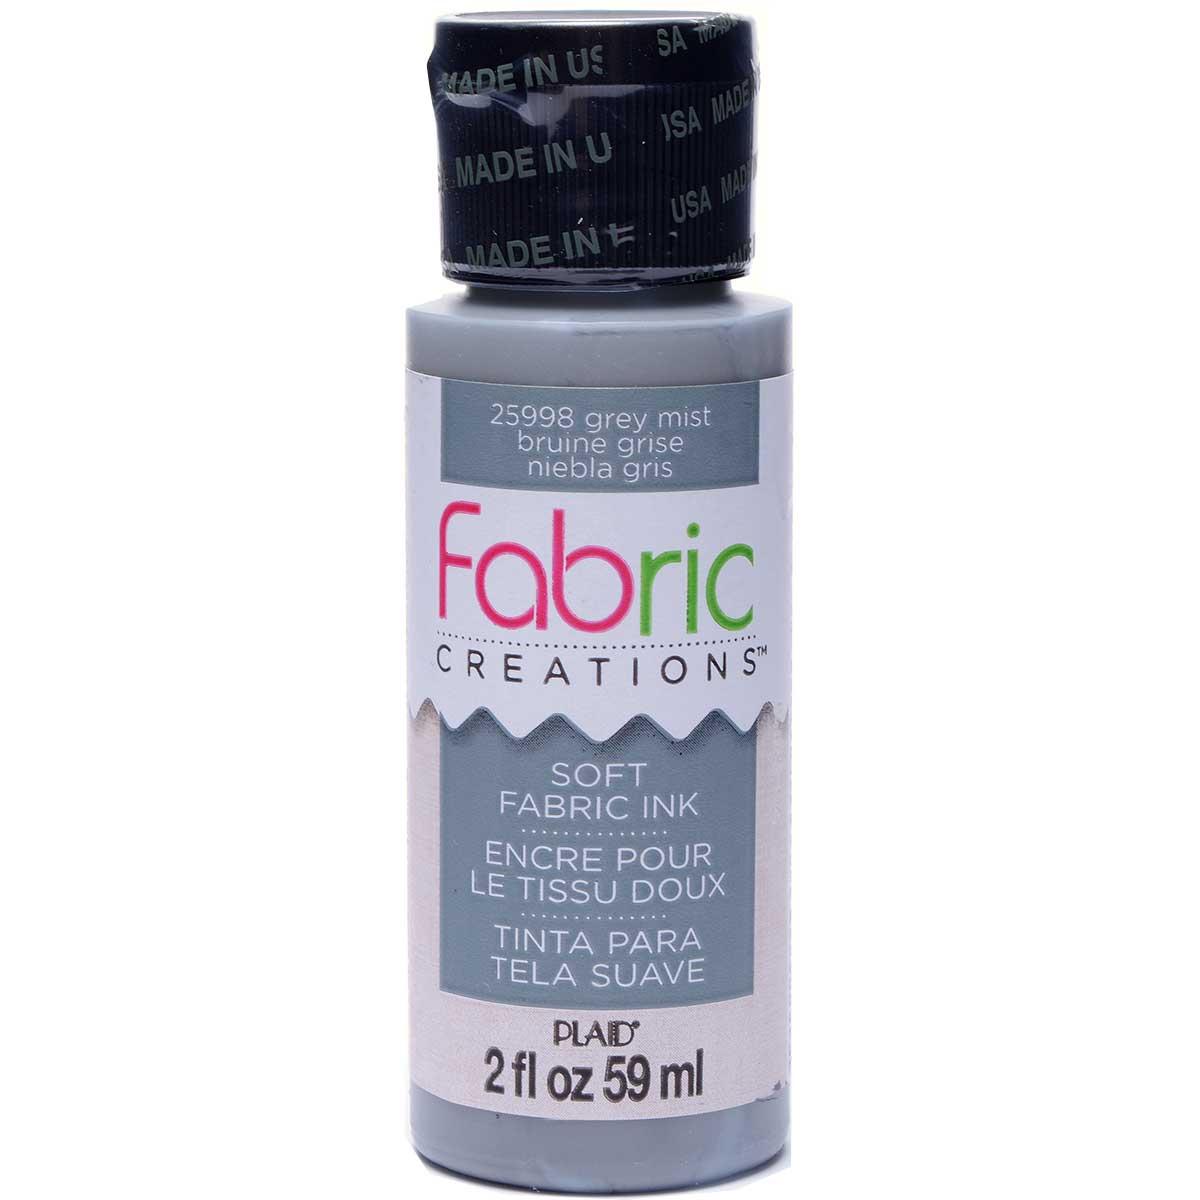 Fabric Creations™ Soft Fabric Inks - Grey Mist, 2 oz. - 25998